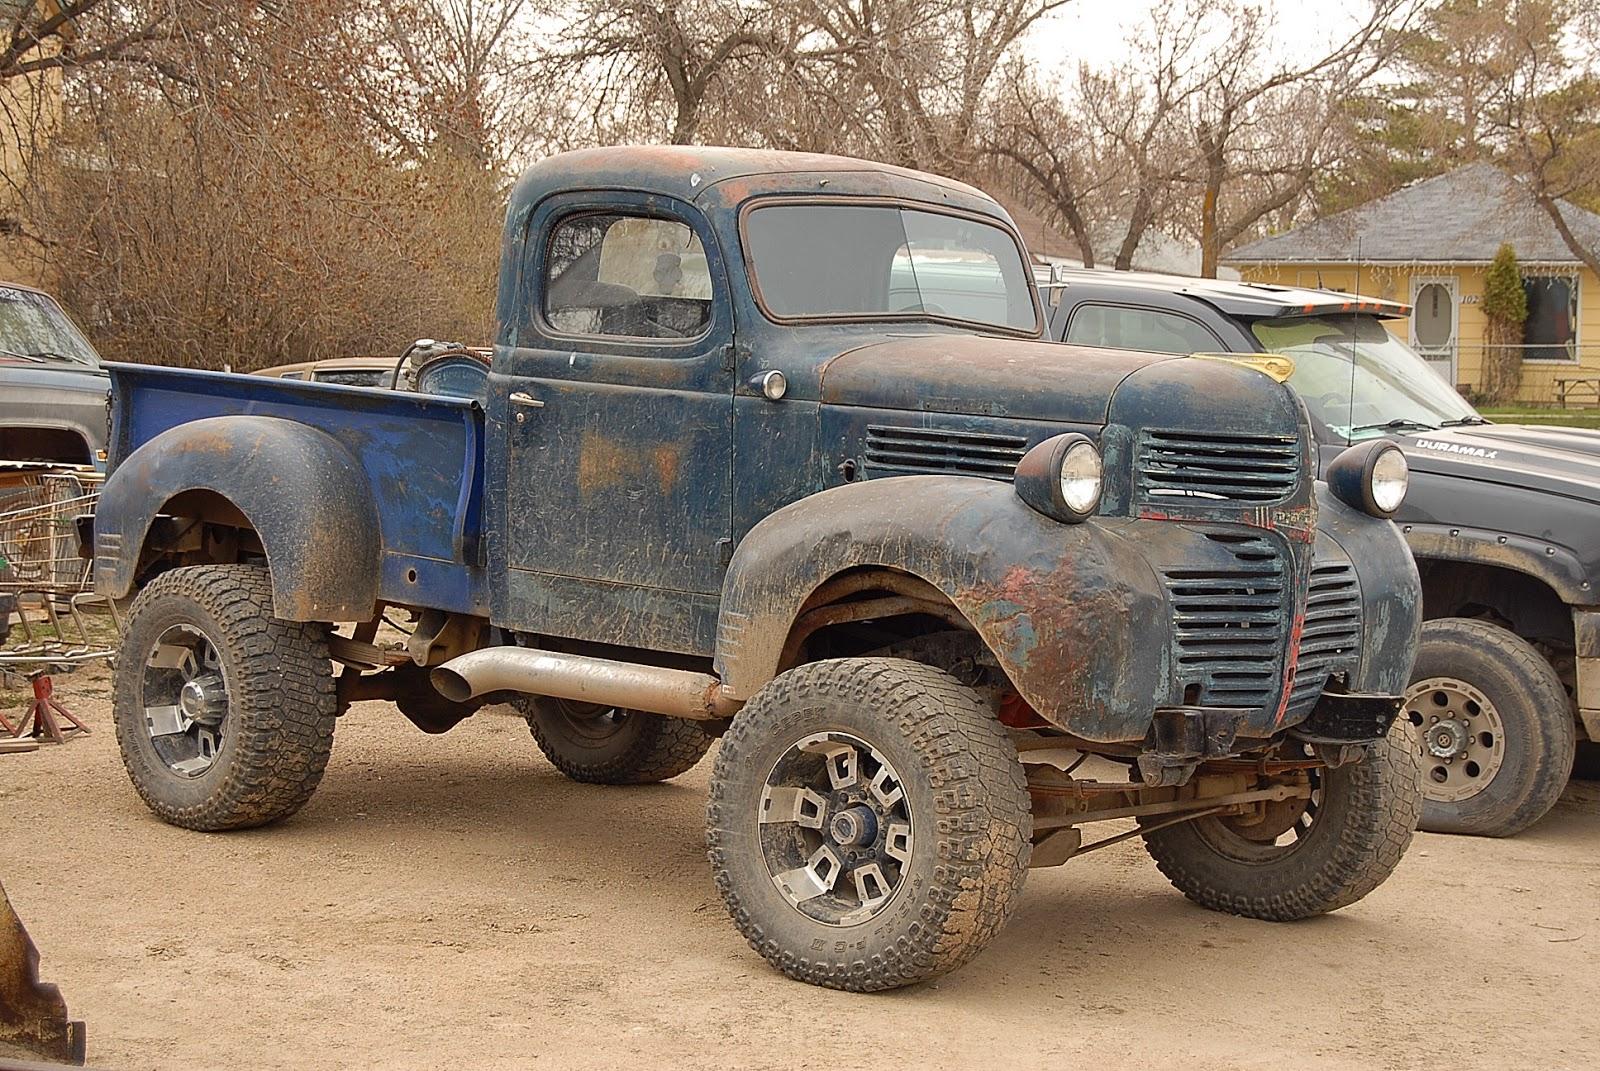 autoliterate: 1947 Dodge 1/2 ton truck